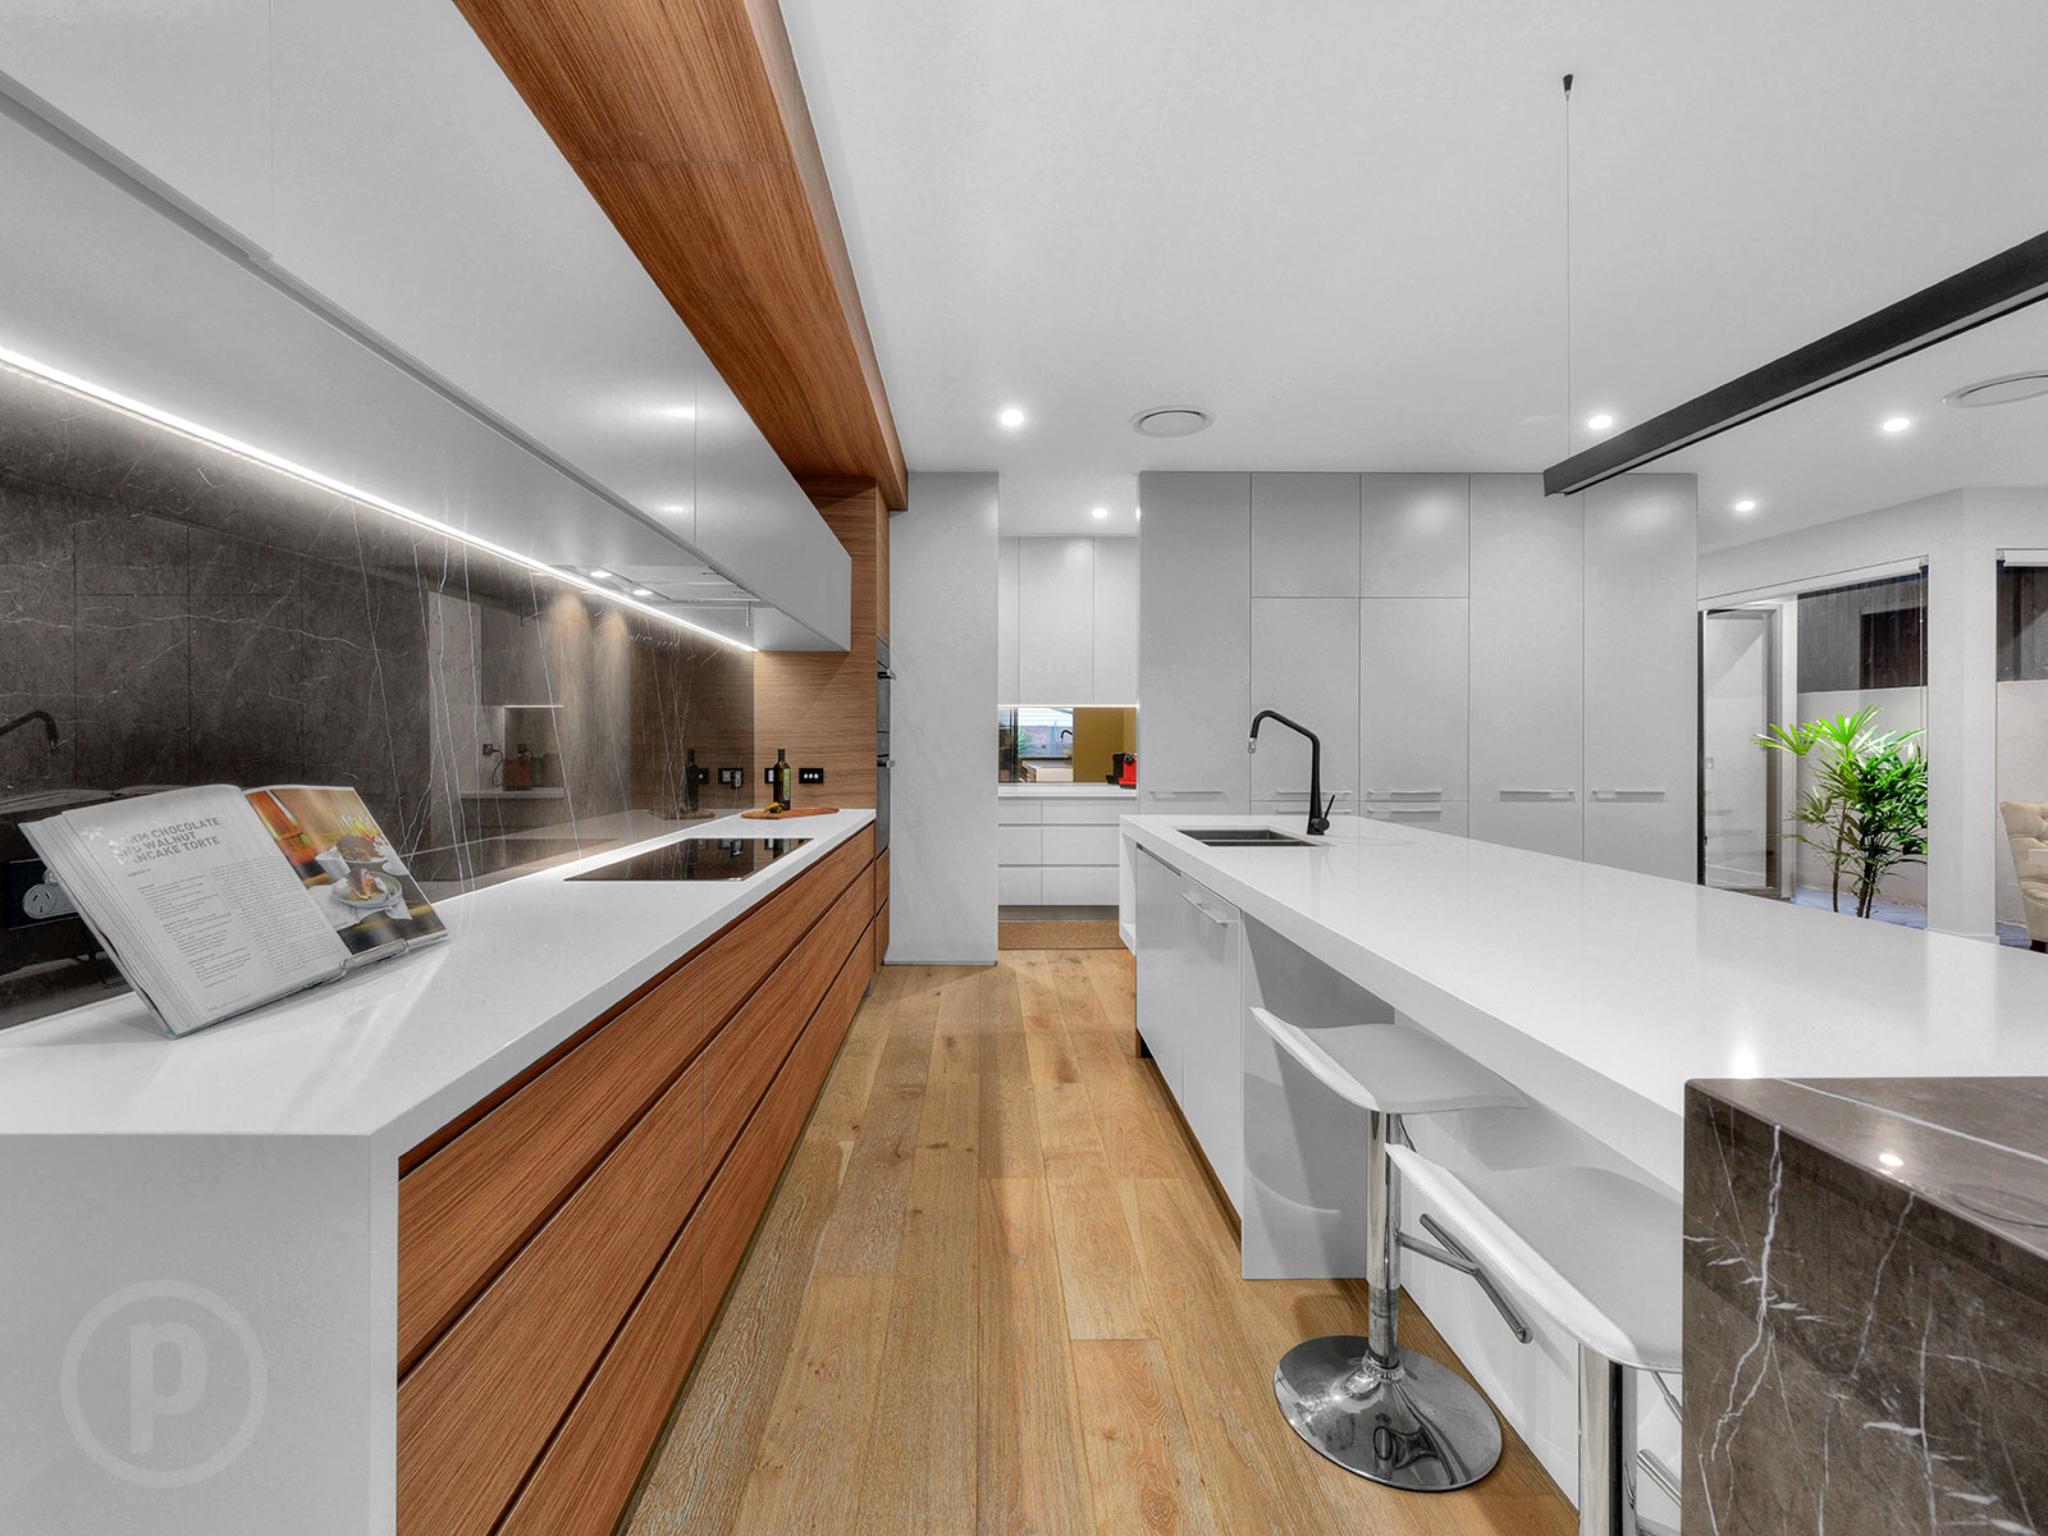 Kitchen property in camphill qld kitchen pinterest kitchens